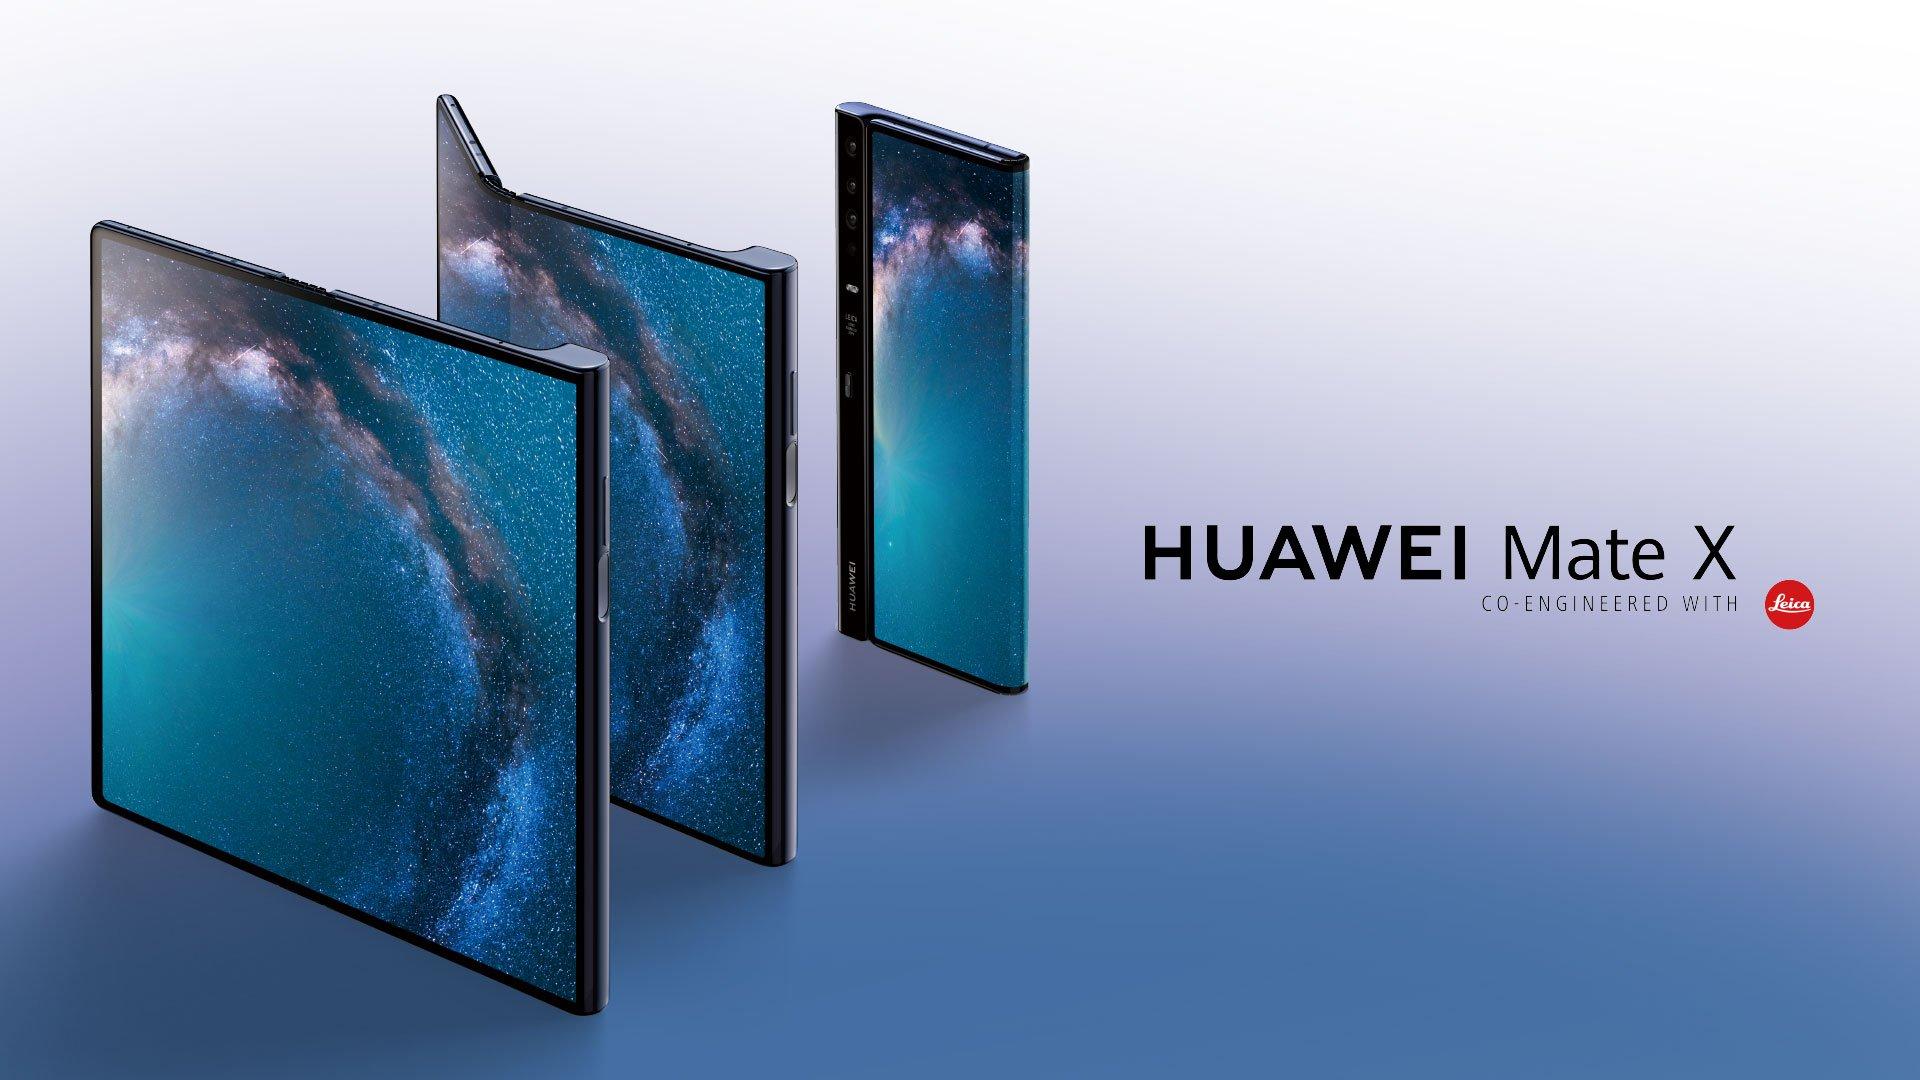 [Nouvelles Technologies] MWC 2019 : Le Huawei Mate X